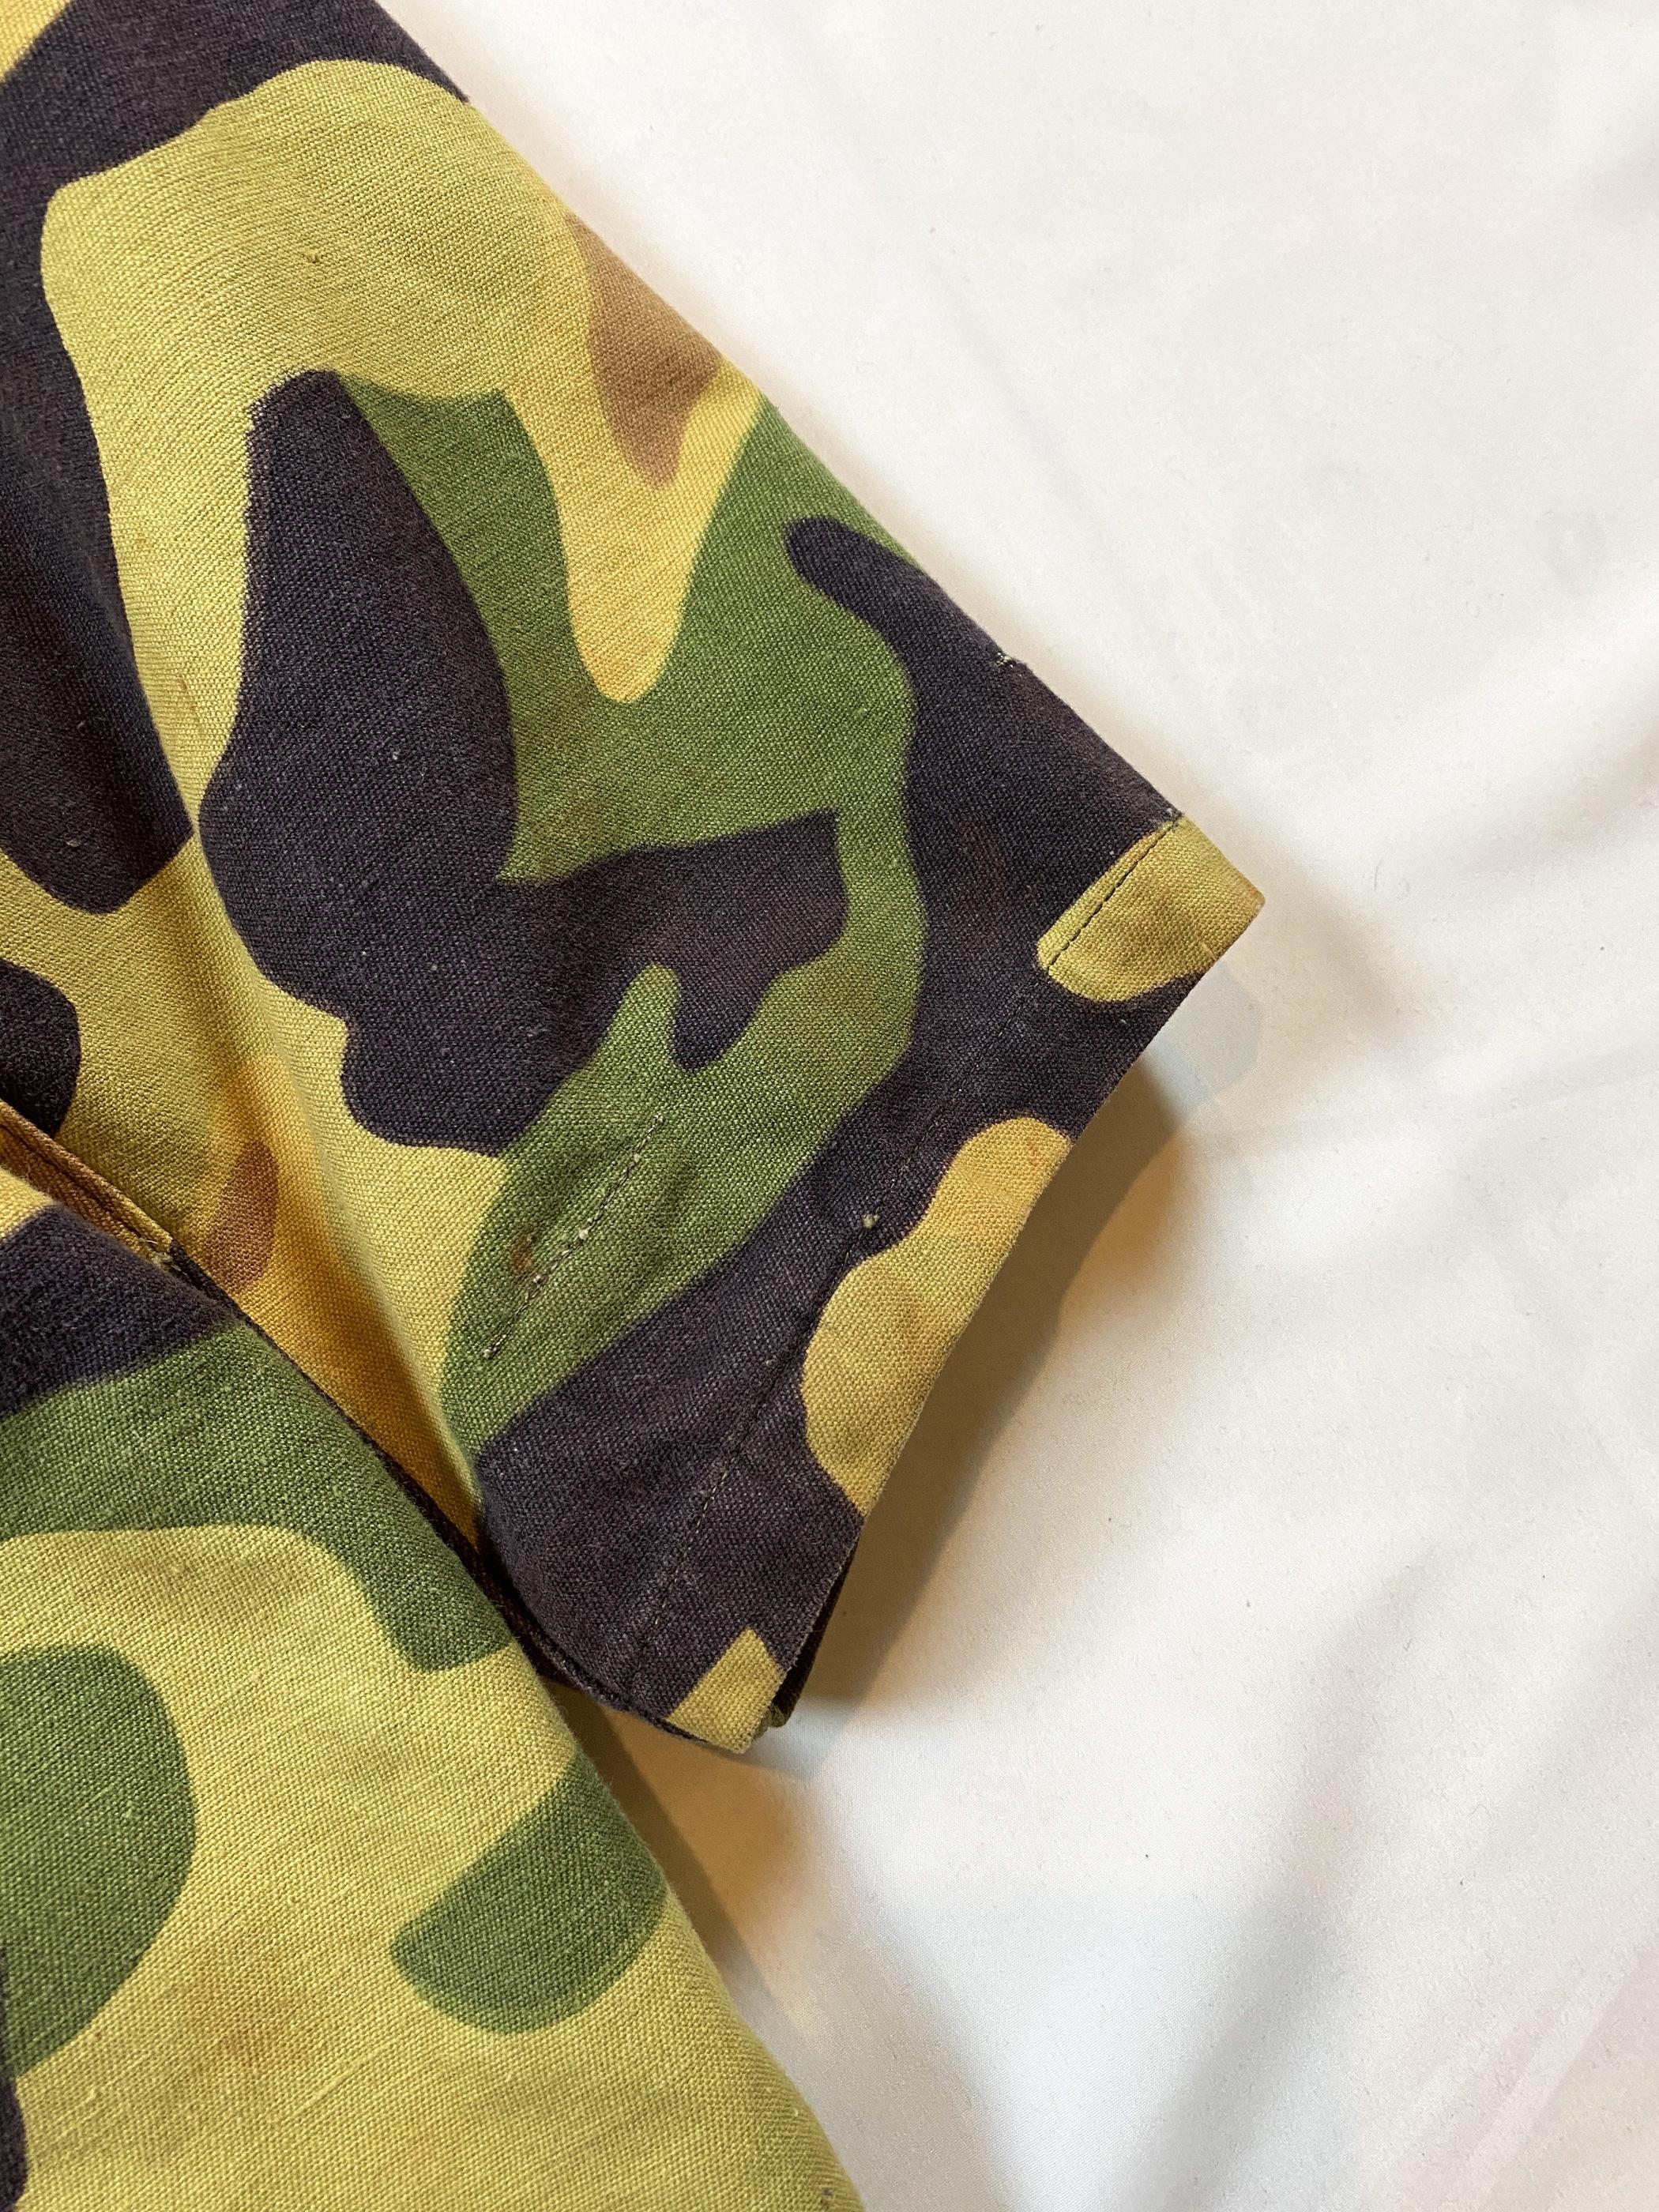 60's CzechSlovakia salamander camouflage coat